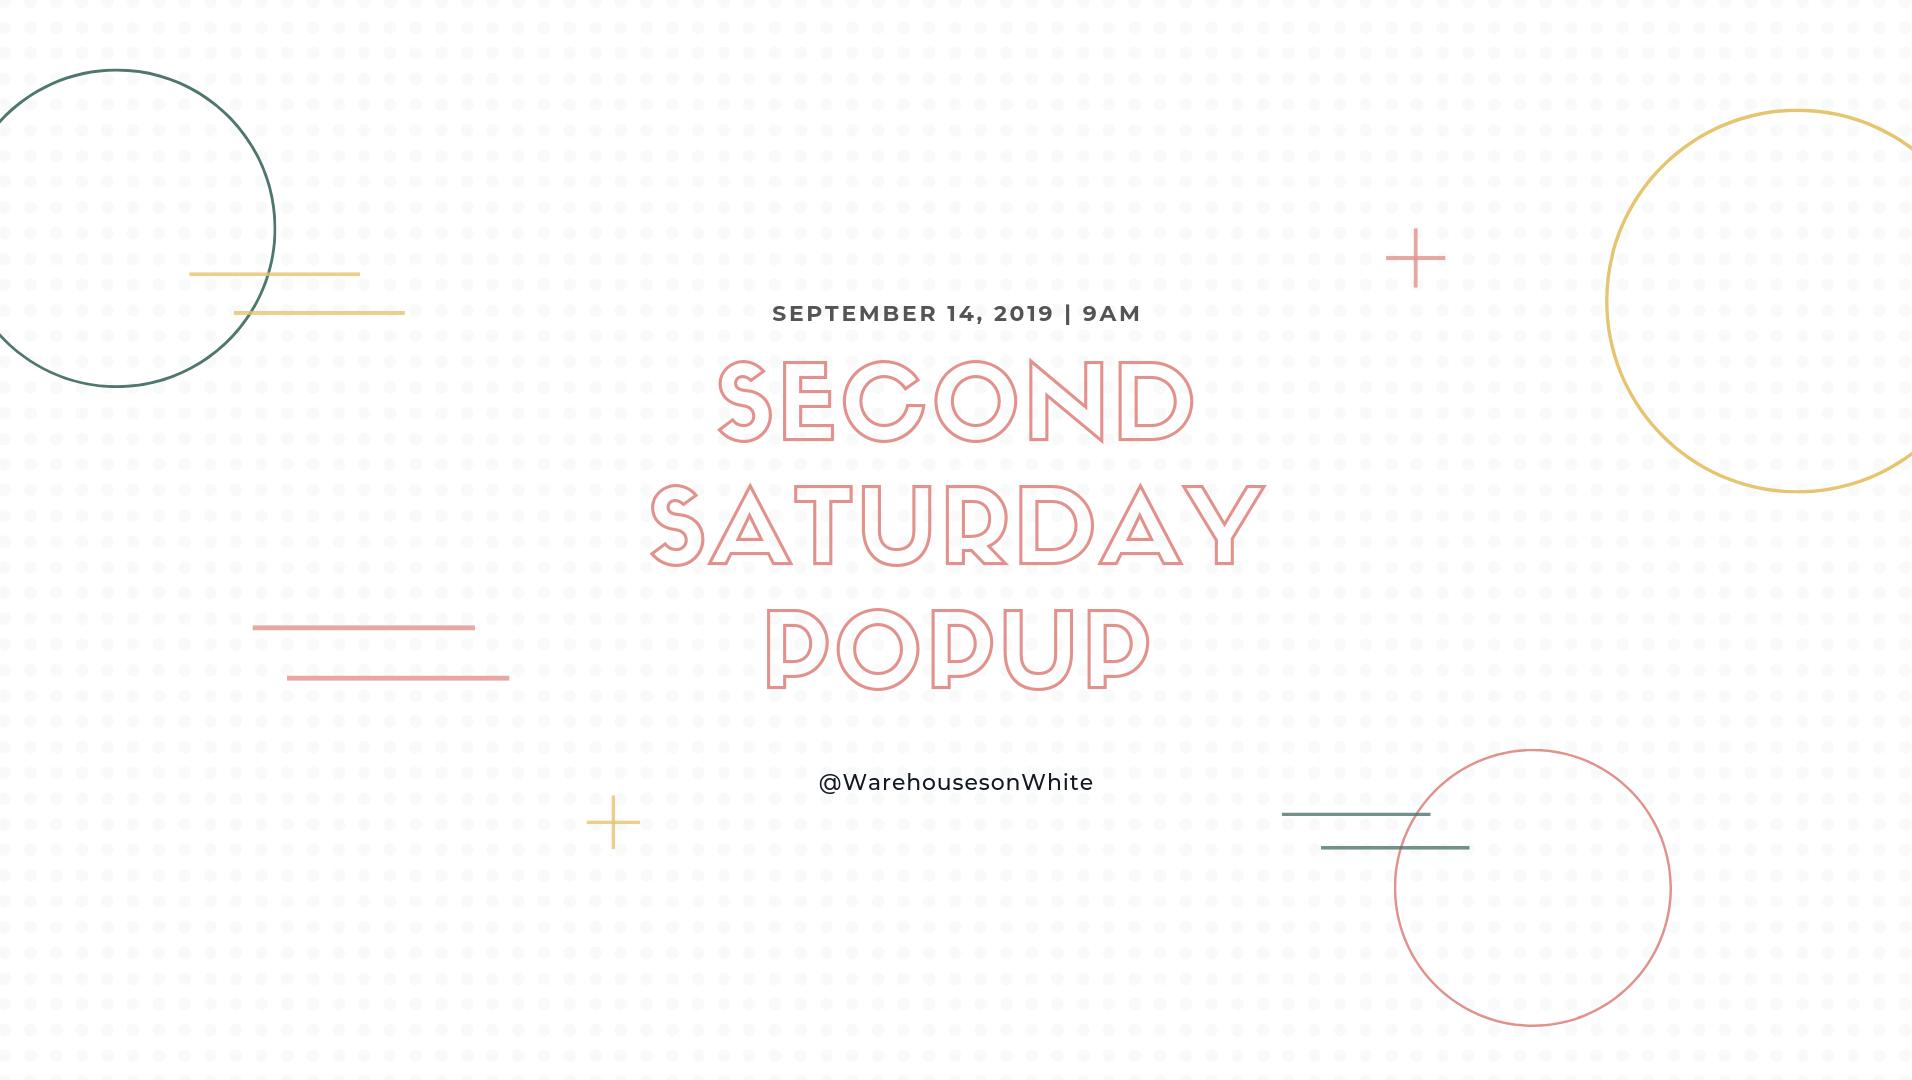 Second Saturday Vendor Pop-Up, September 14th